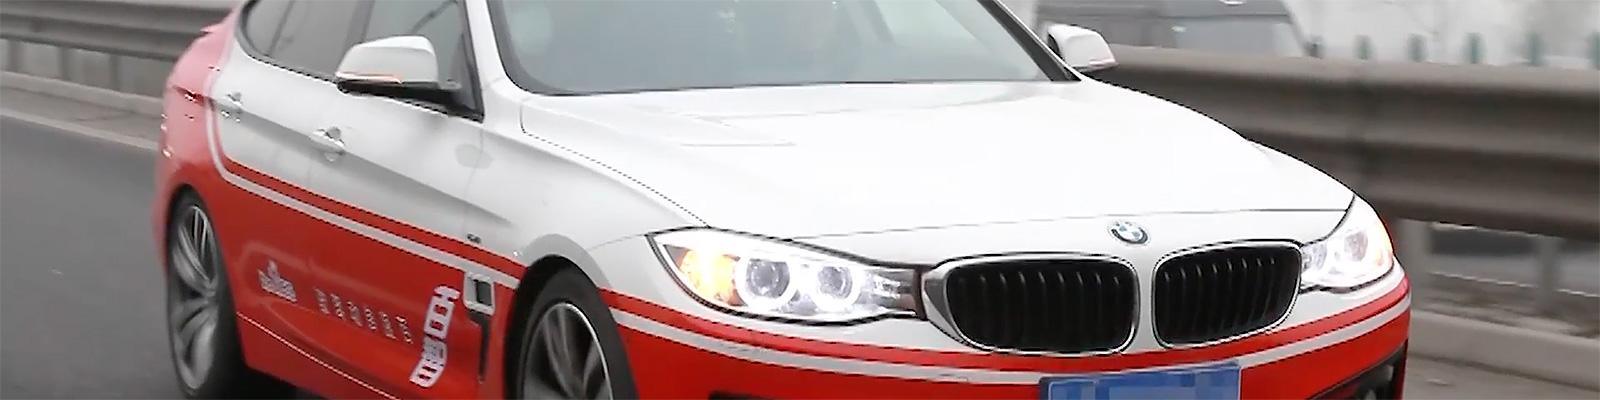 Baidu's Self-Driving Cars to Get U.S. Test Run(Wall Street Journal)